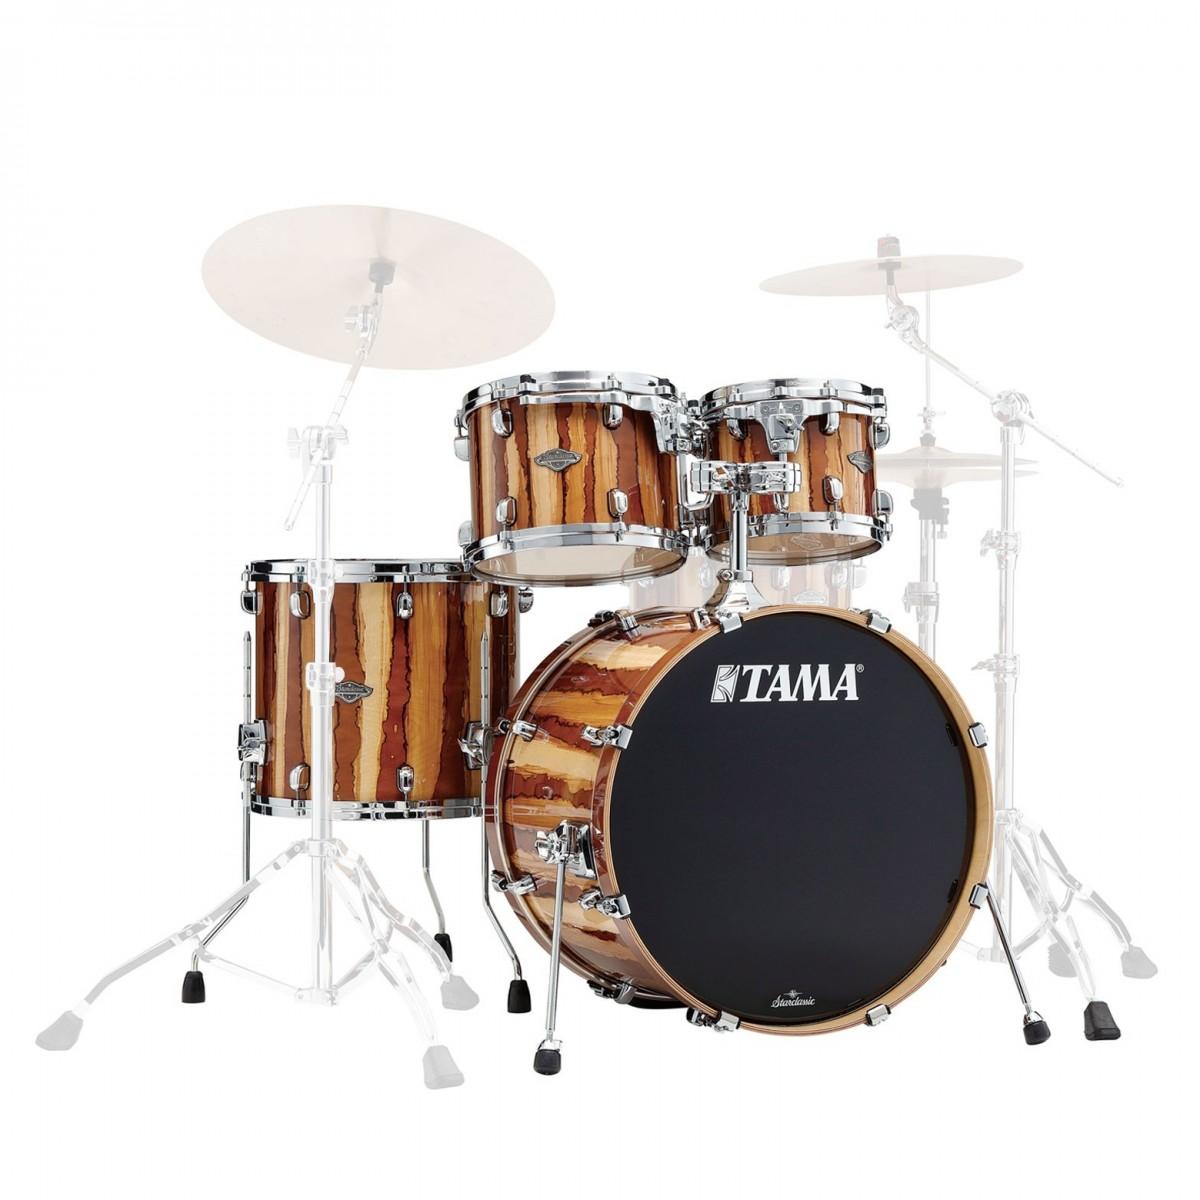 Tama Starclassic Performer 22 4pc Shell Pack, Caramel Aurora